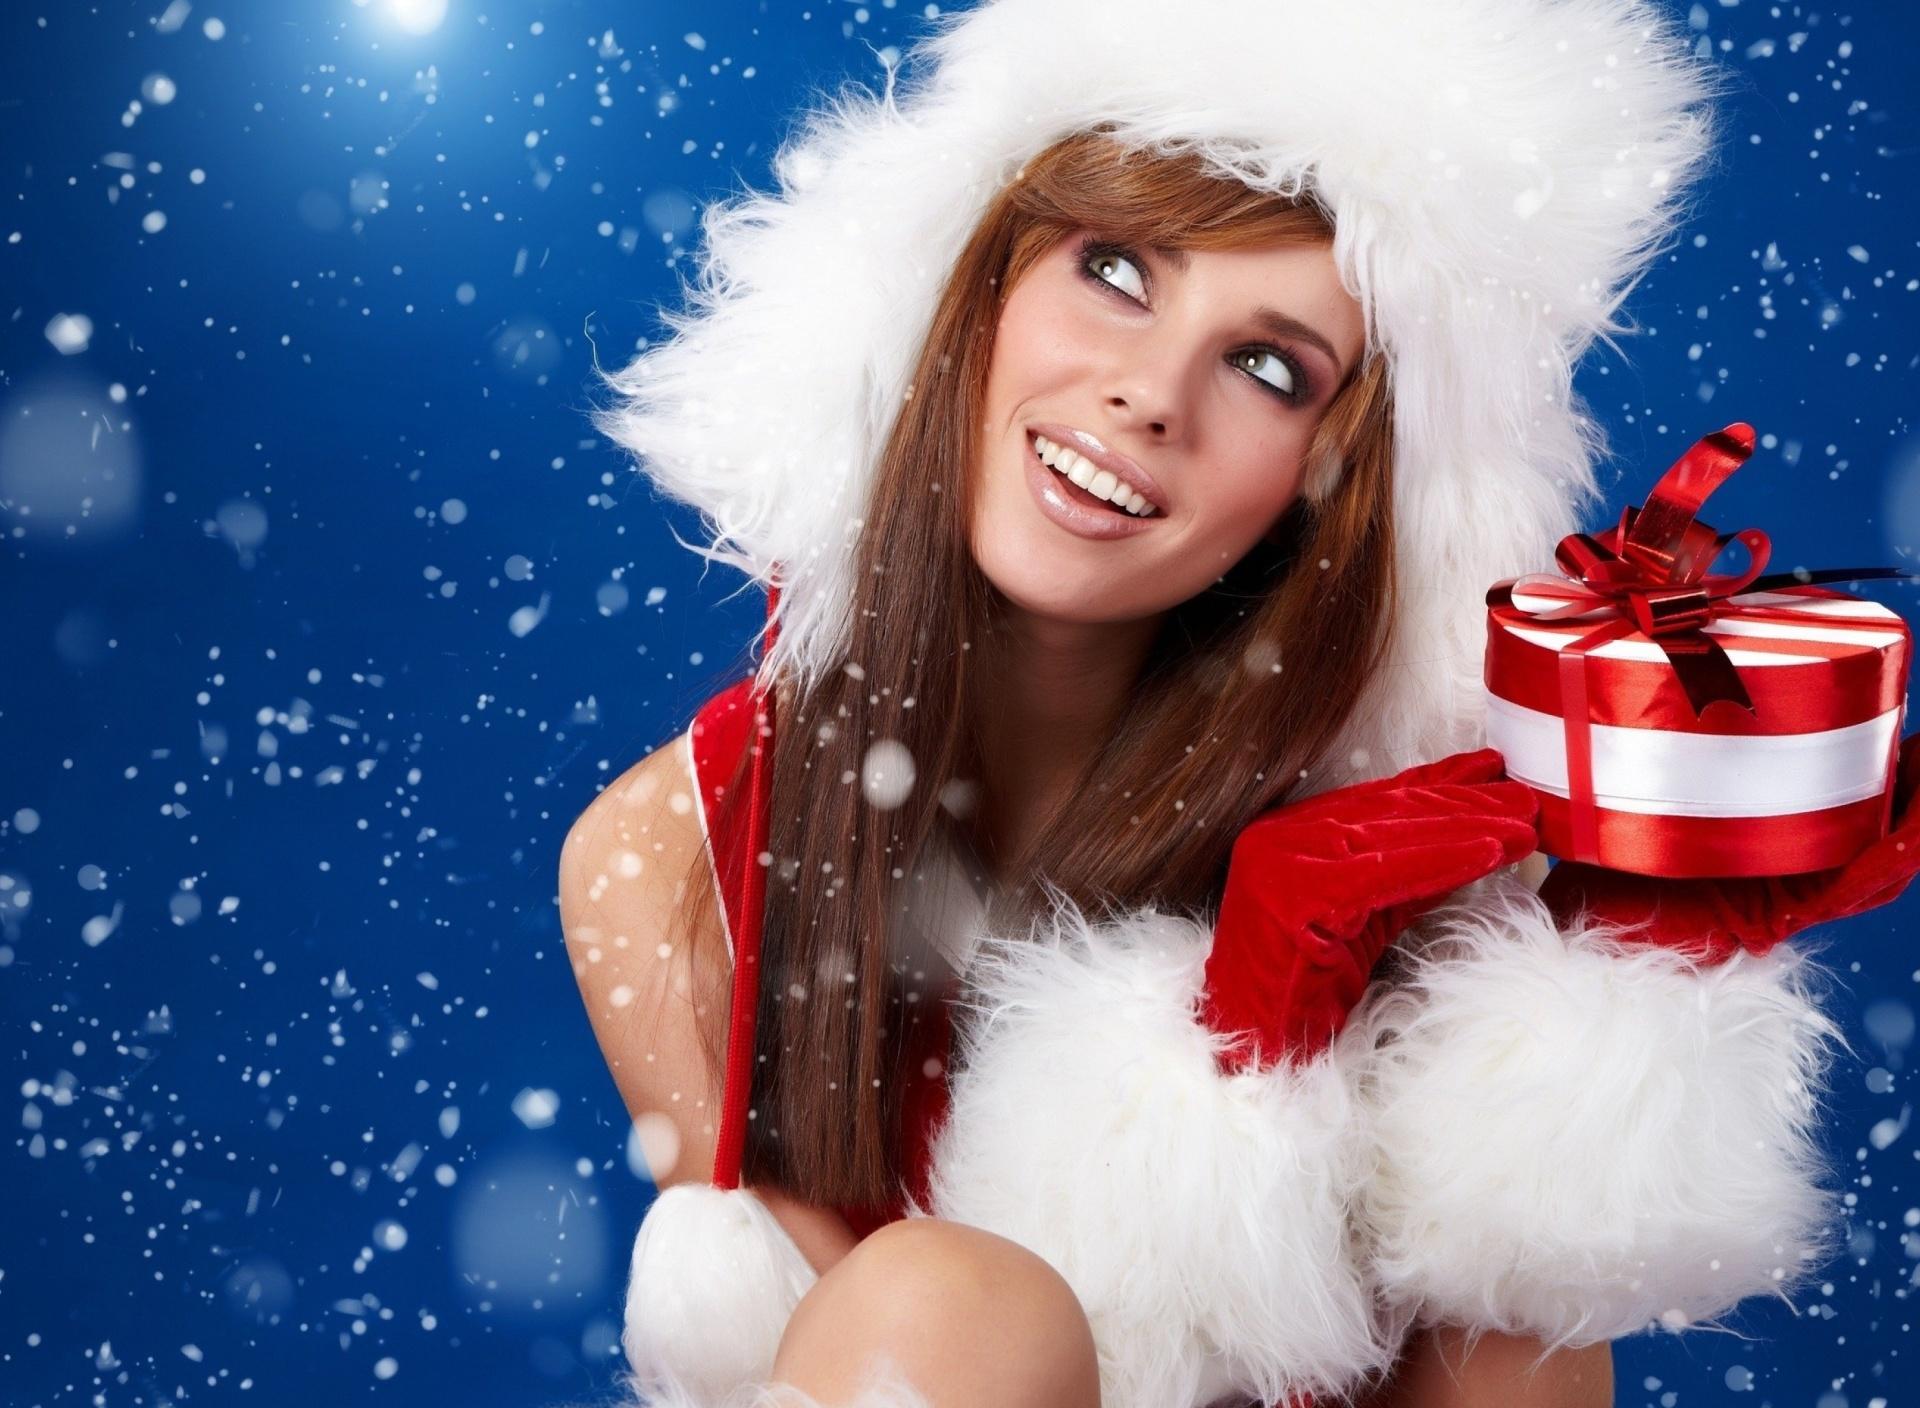 Картинки снегурочка с подарком